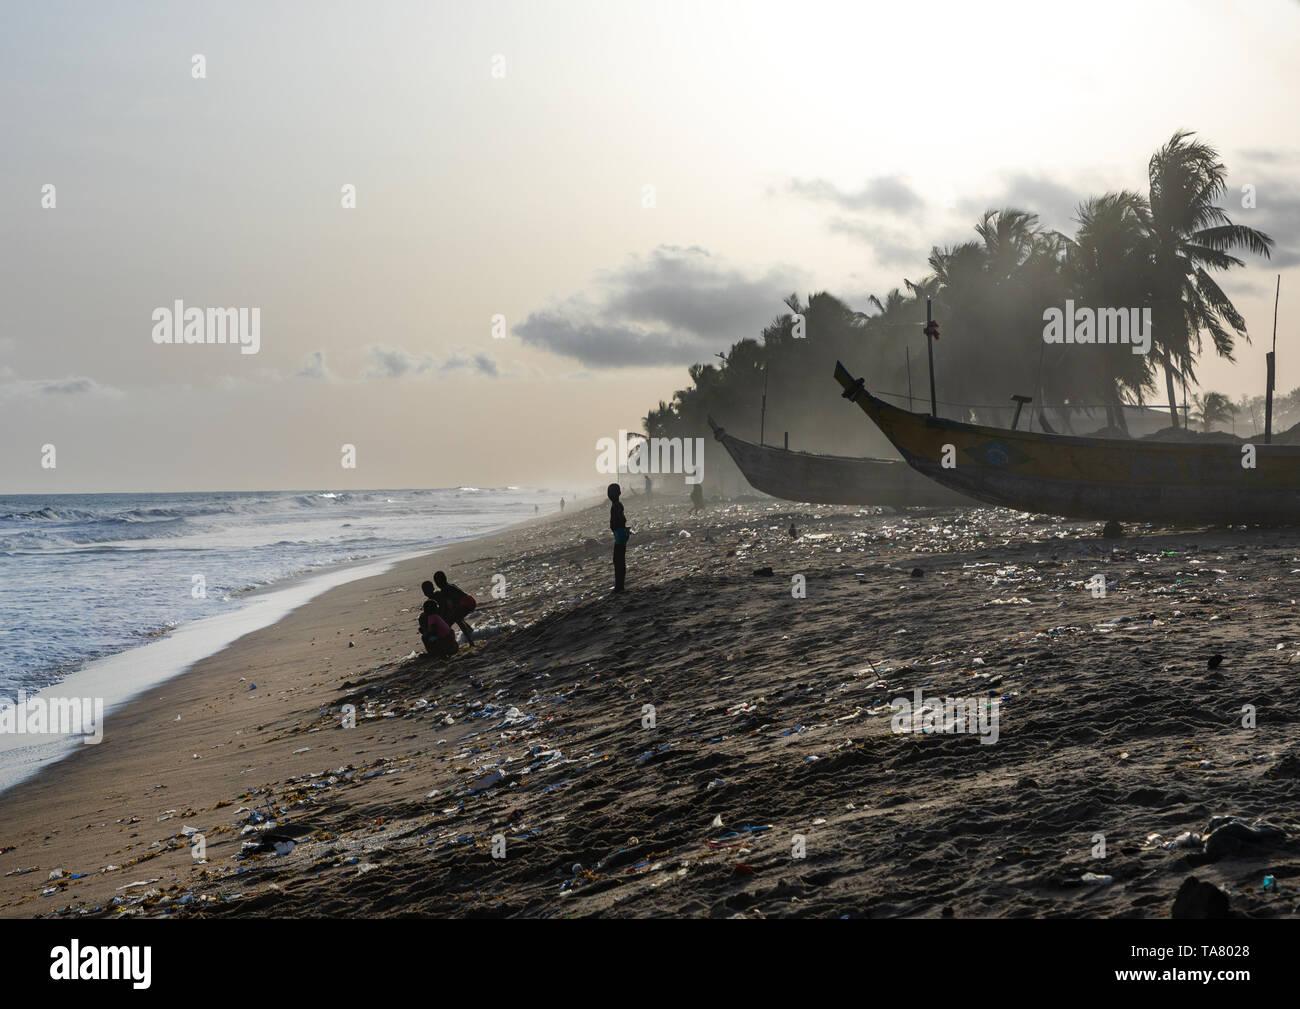 Children on the beach in N'zima fishermen village, Sud-Comoé, Grand-Bassam, Ivory Coast Stock Photo